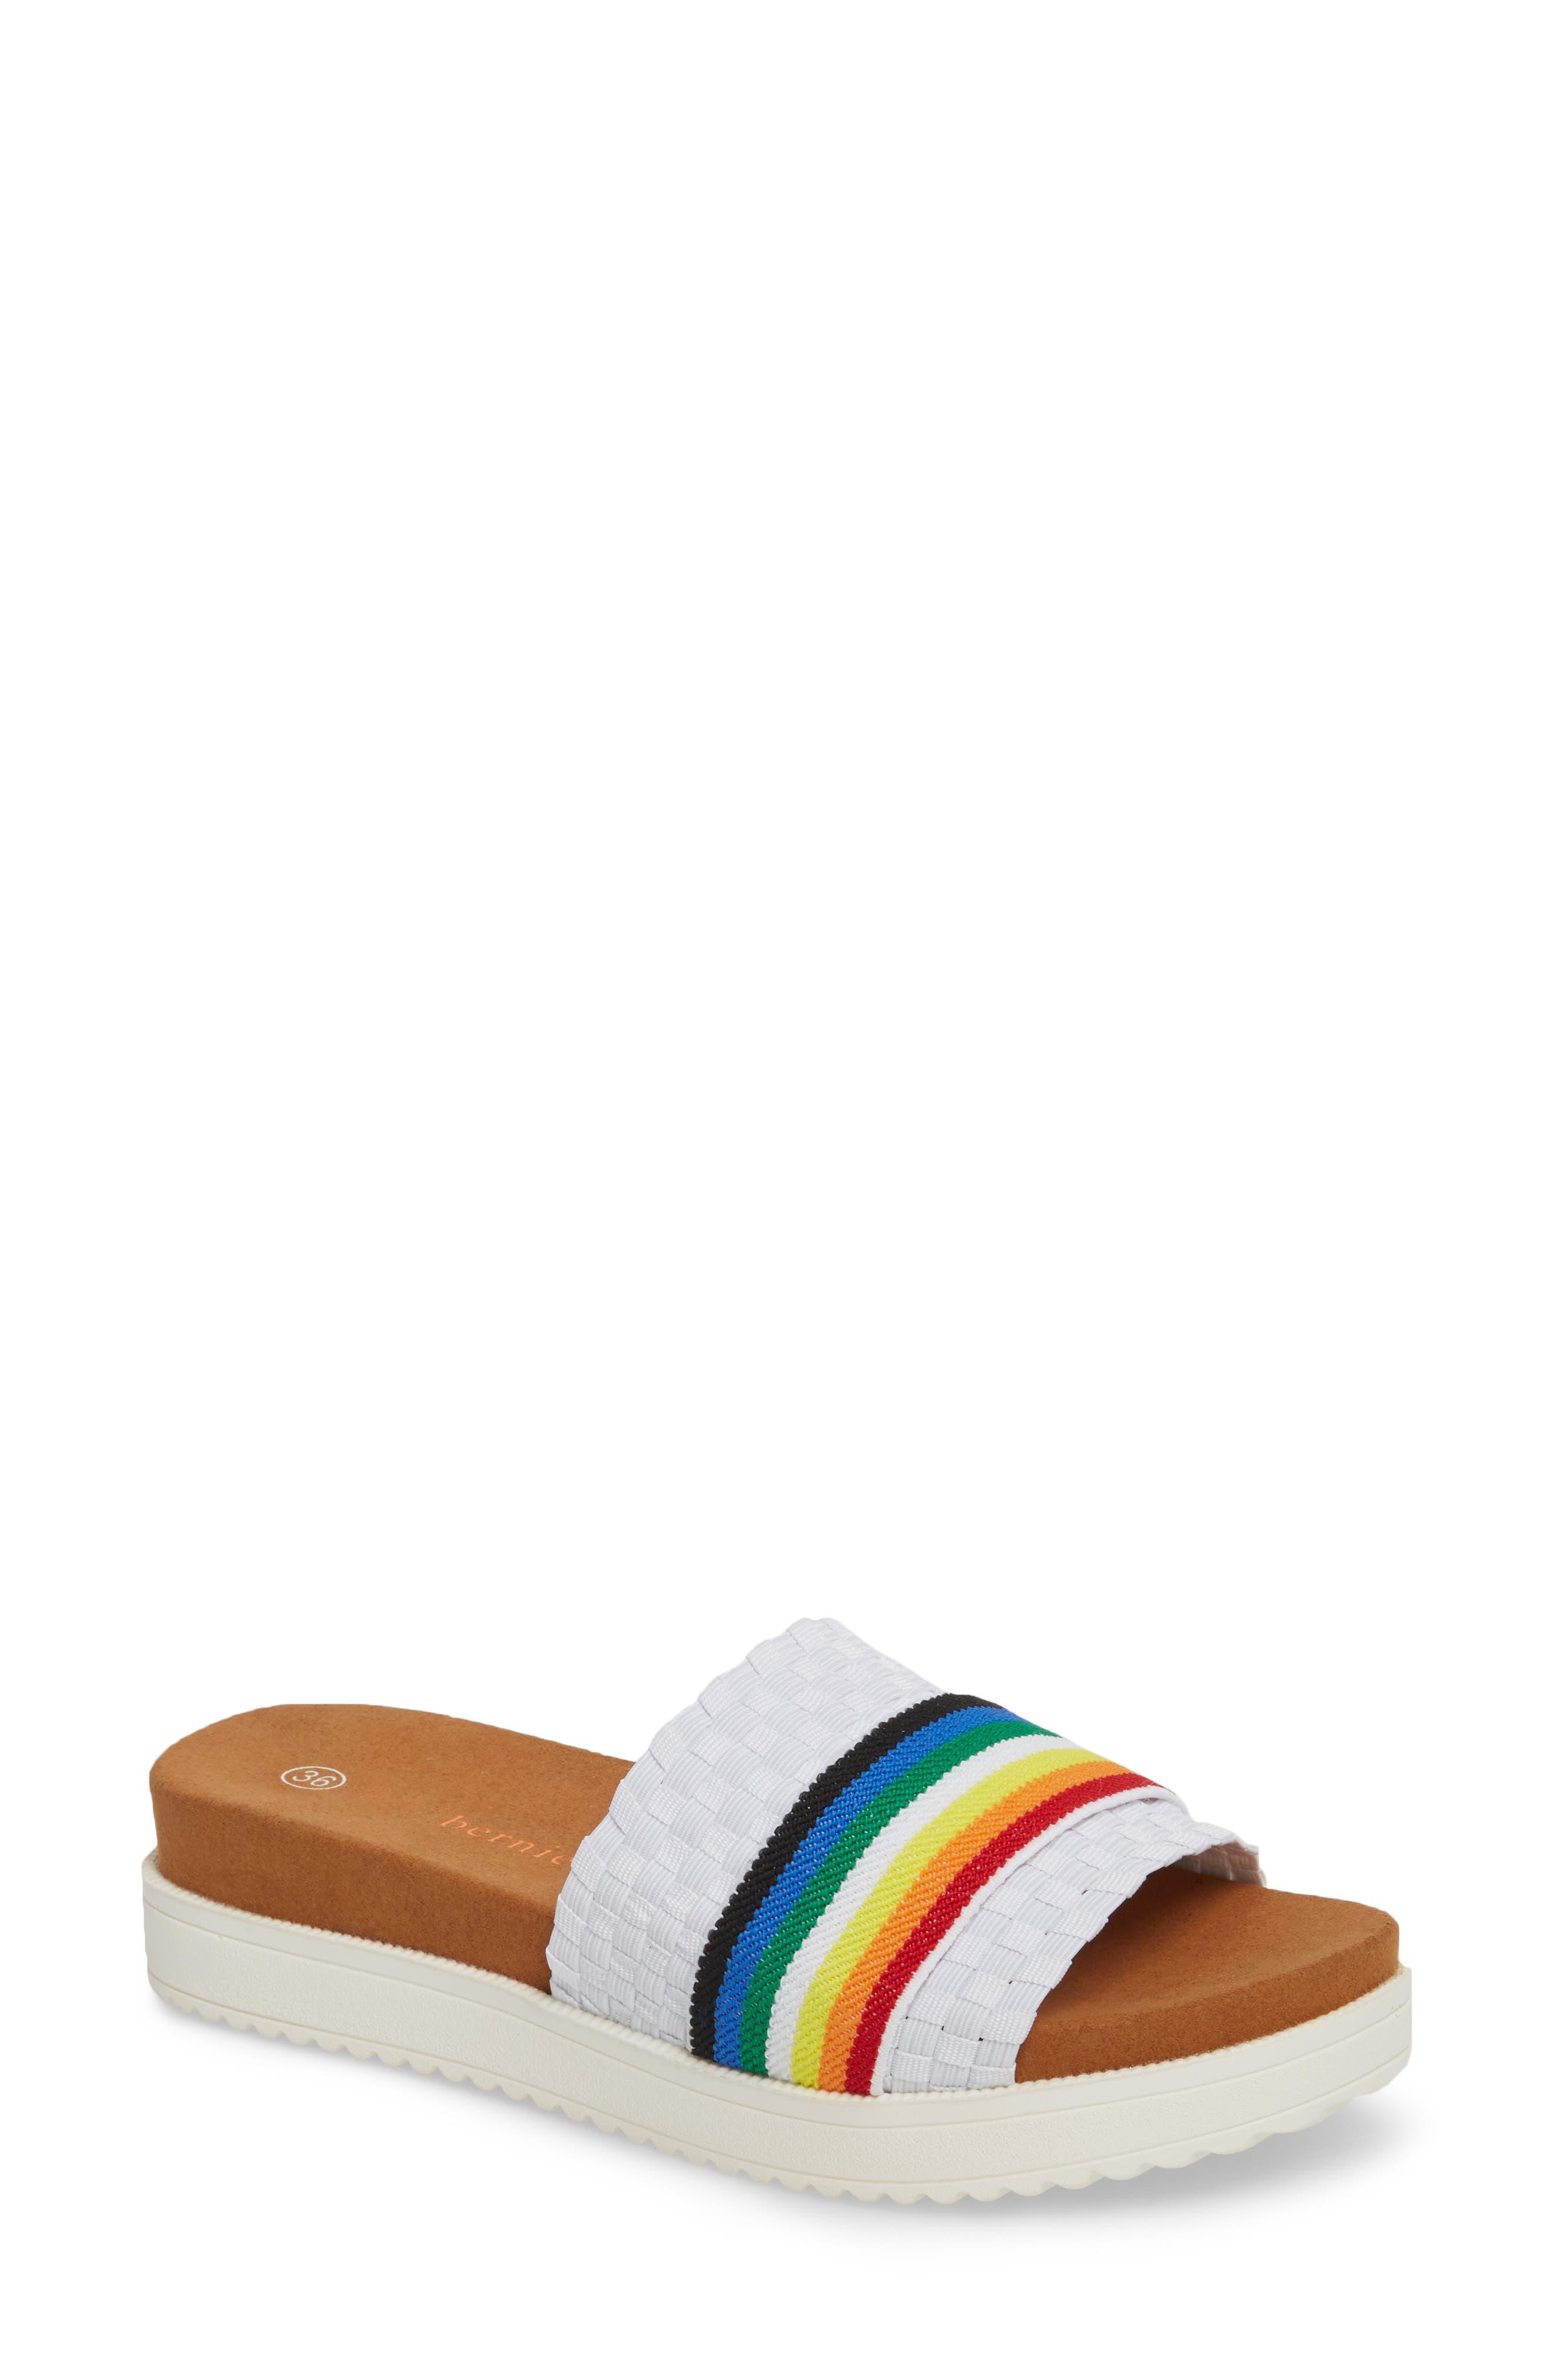 New York Sandal